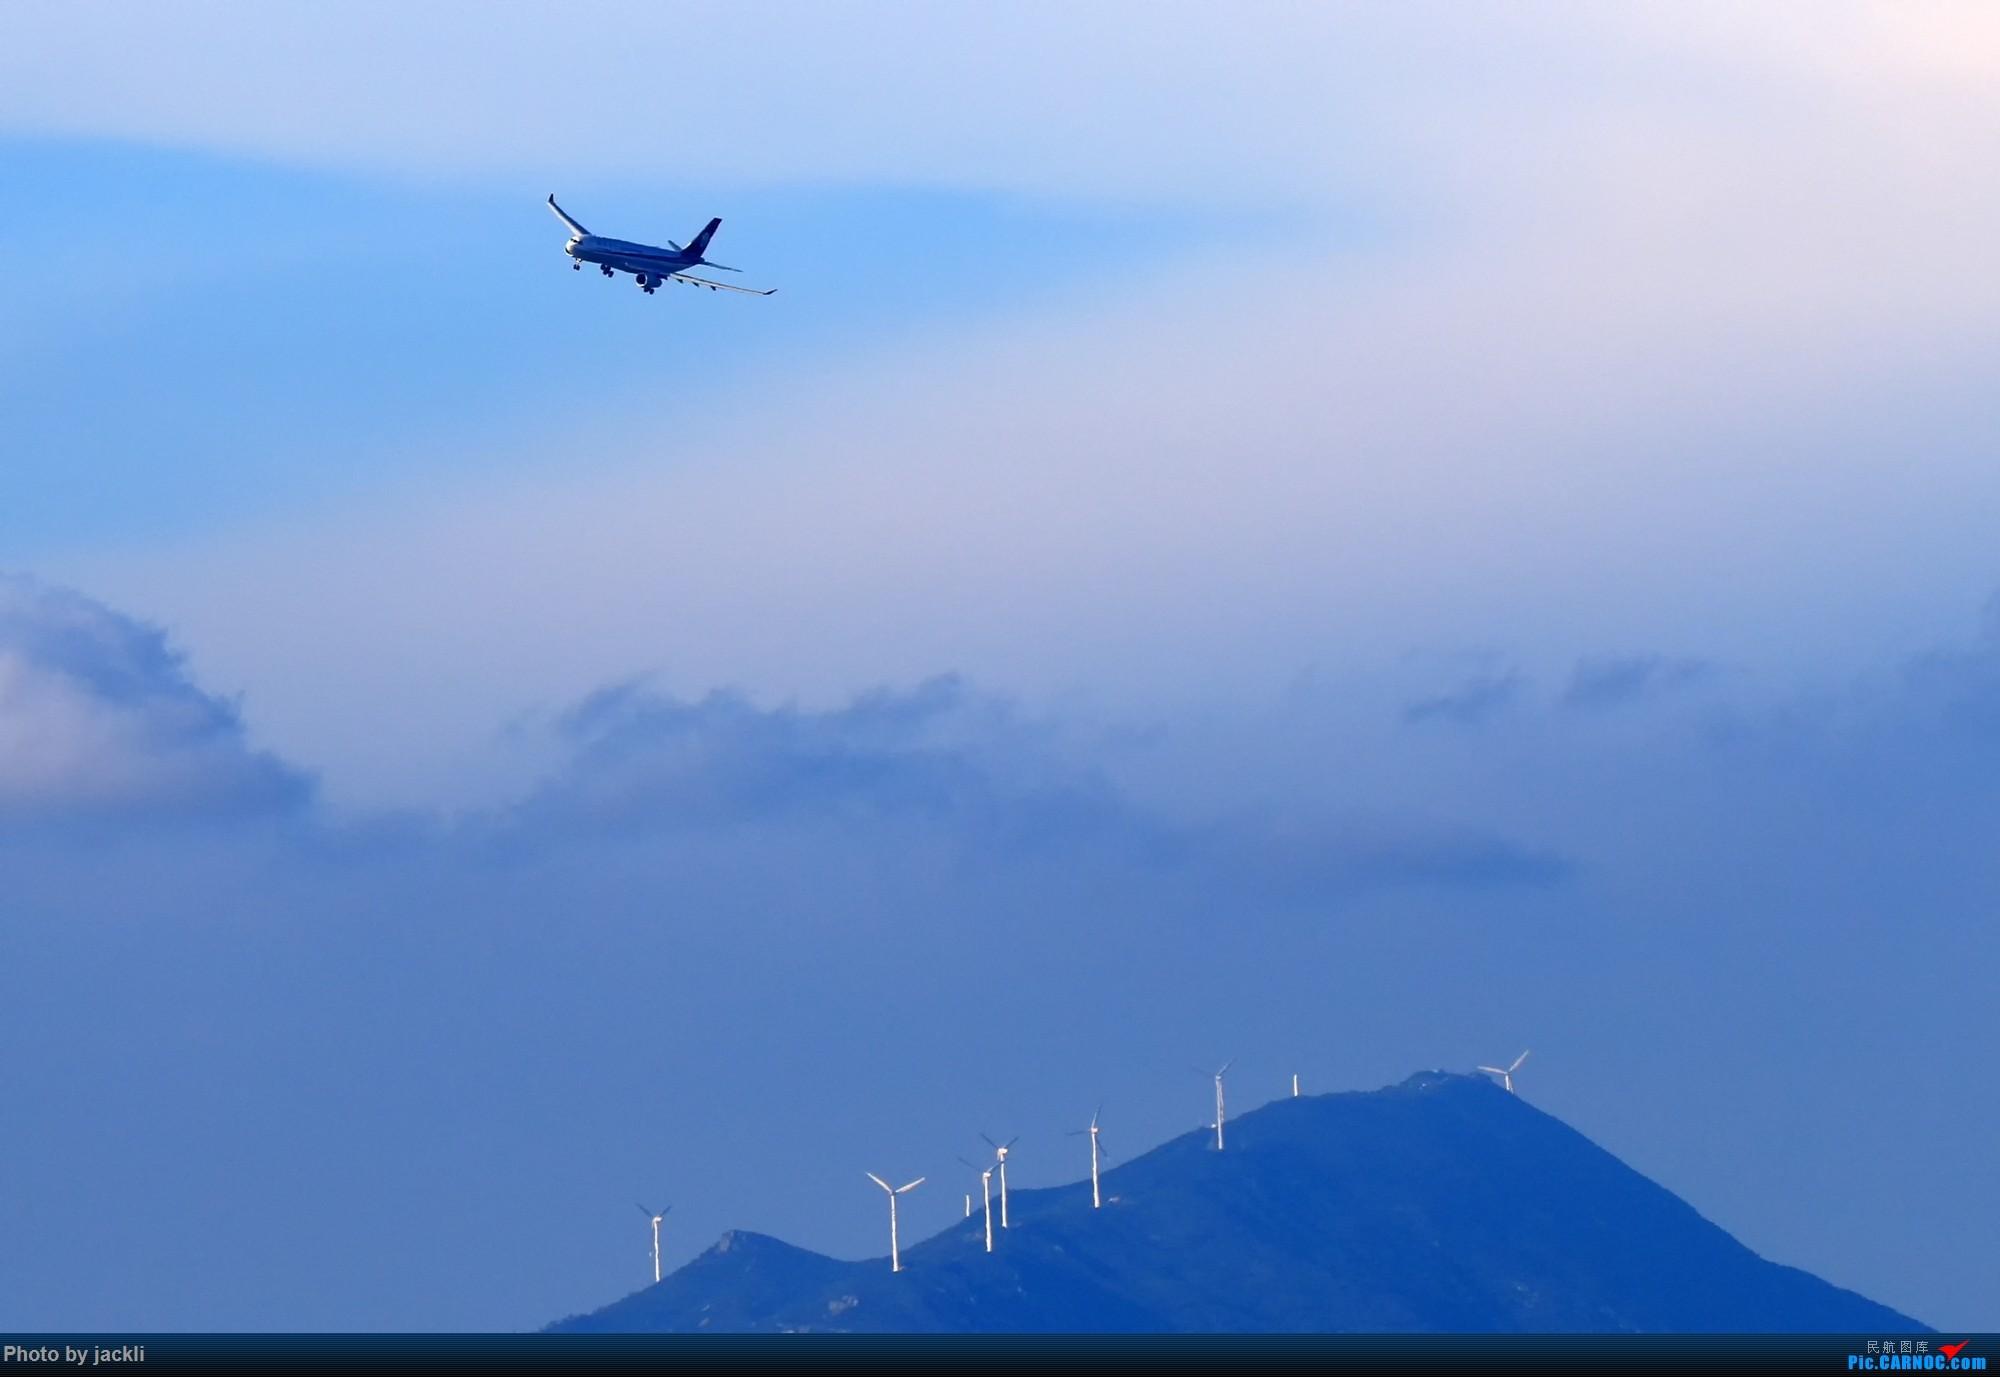 Re:[原创]【JackLi】抓住好天的尾巴~川航330在珠海训练~ AIRBUS A330-200 B-6517 中国珠海金湾机场